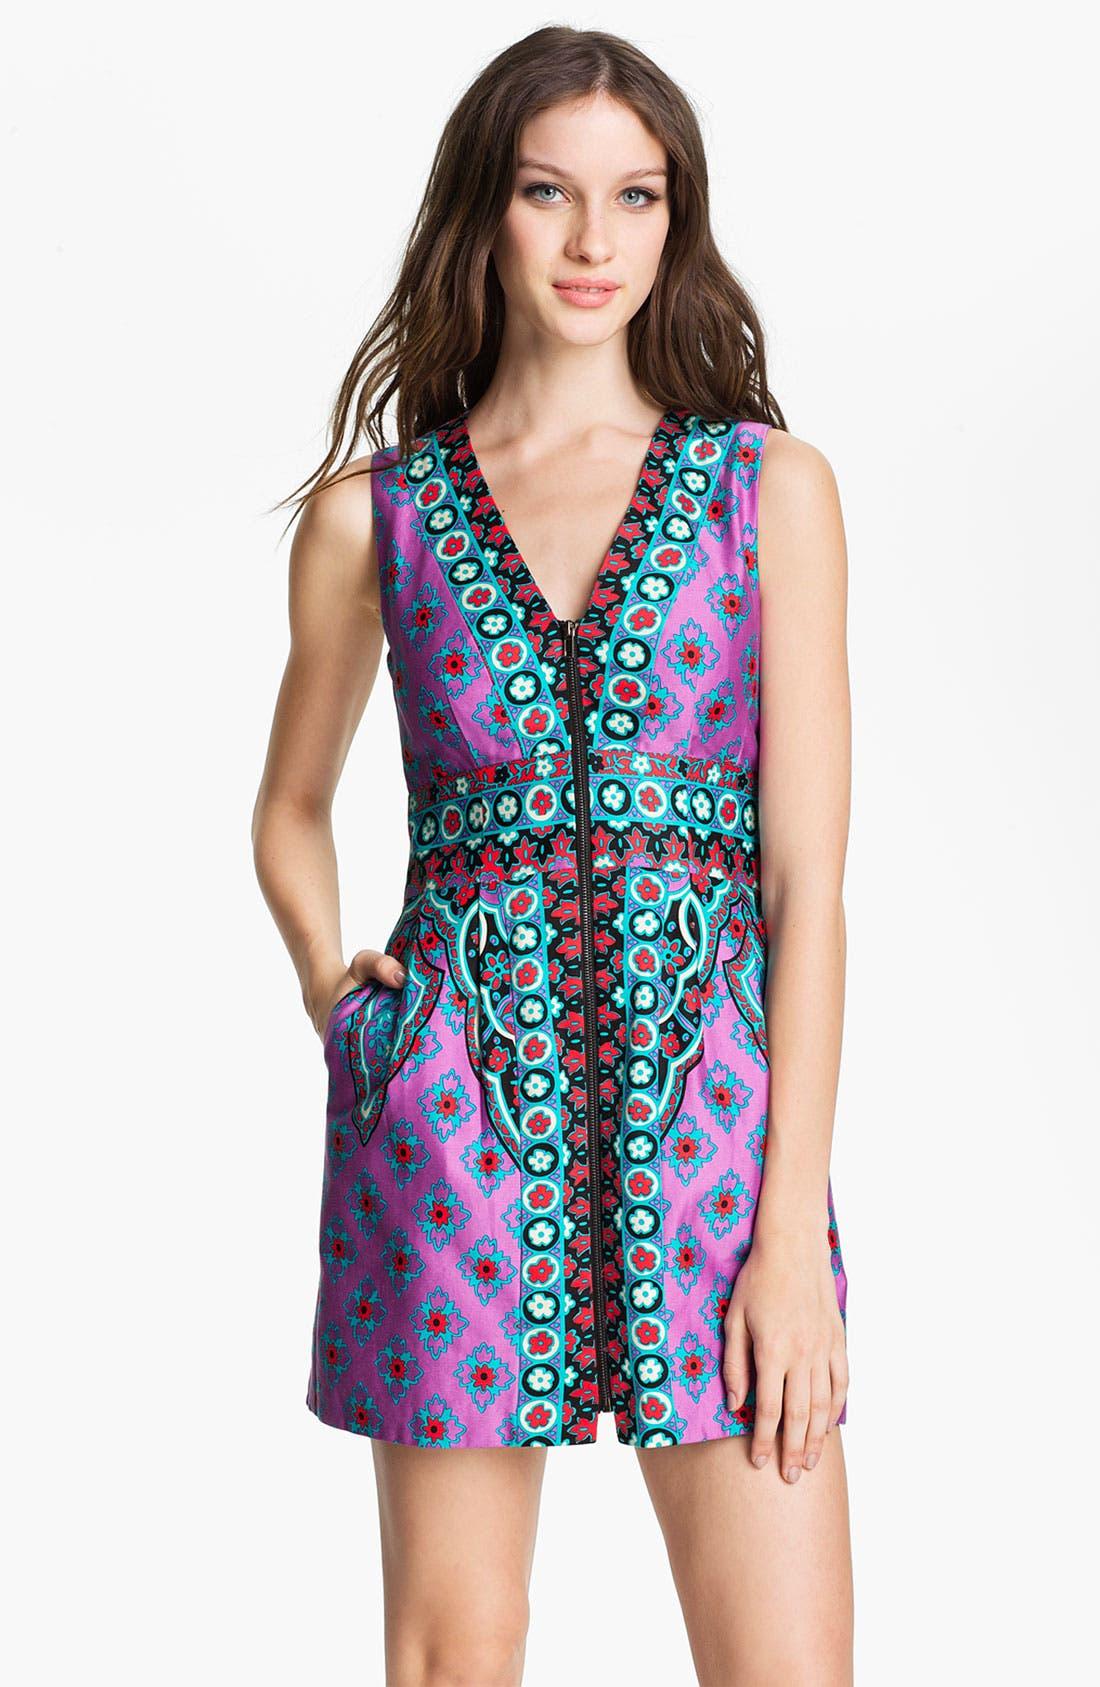 Alternate Image 1 Selected - Nanette Lepore 'Funkadelic' Stretch Cotton Sheath Dress